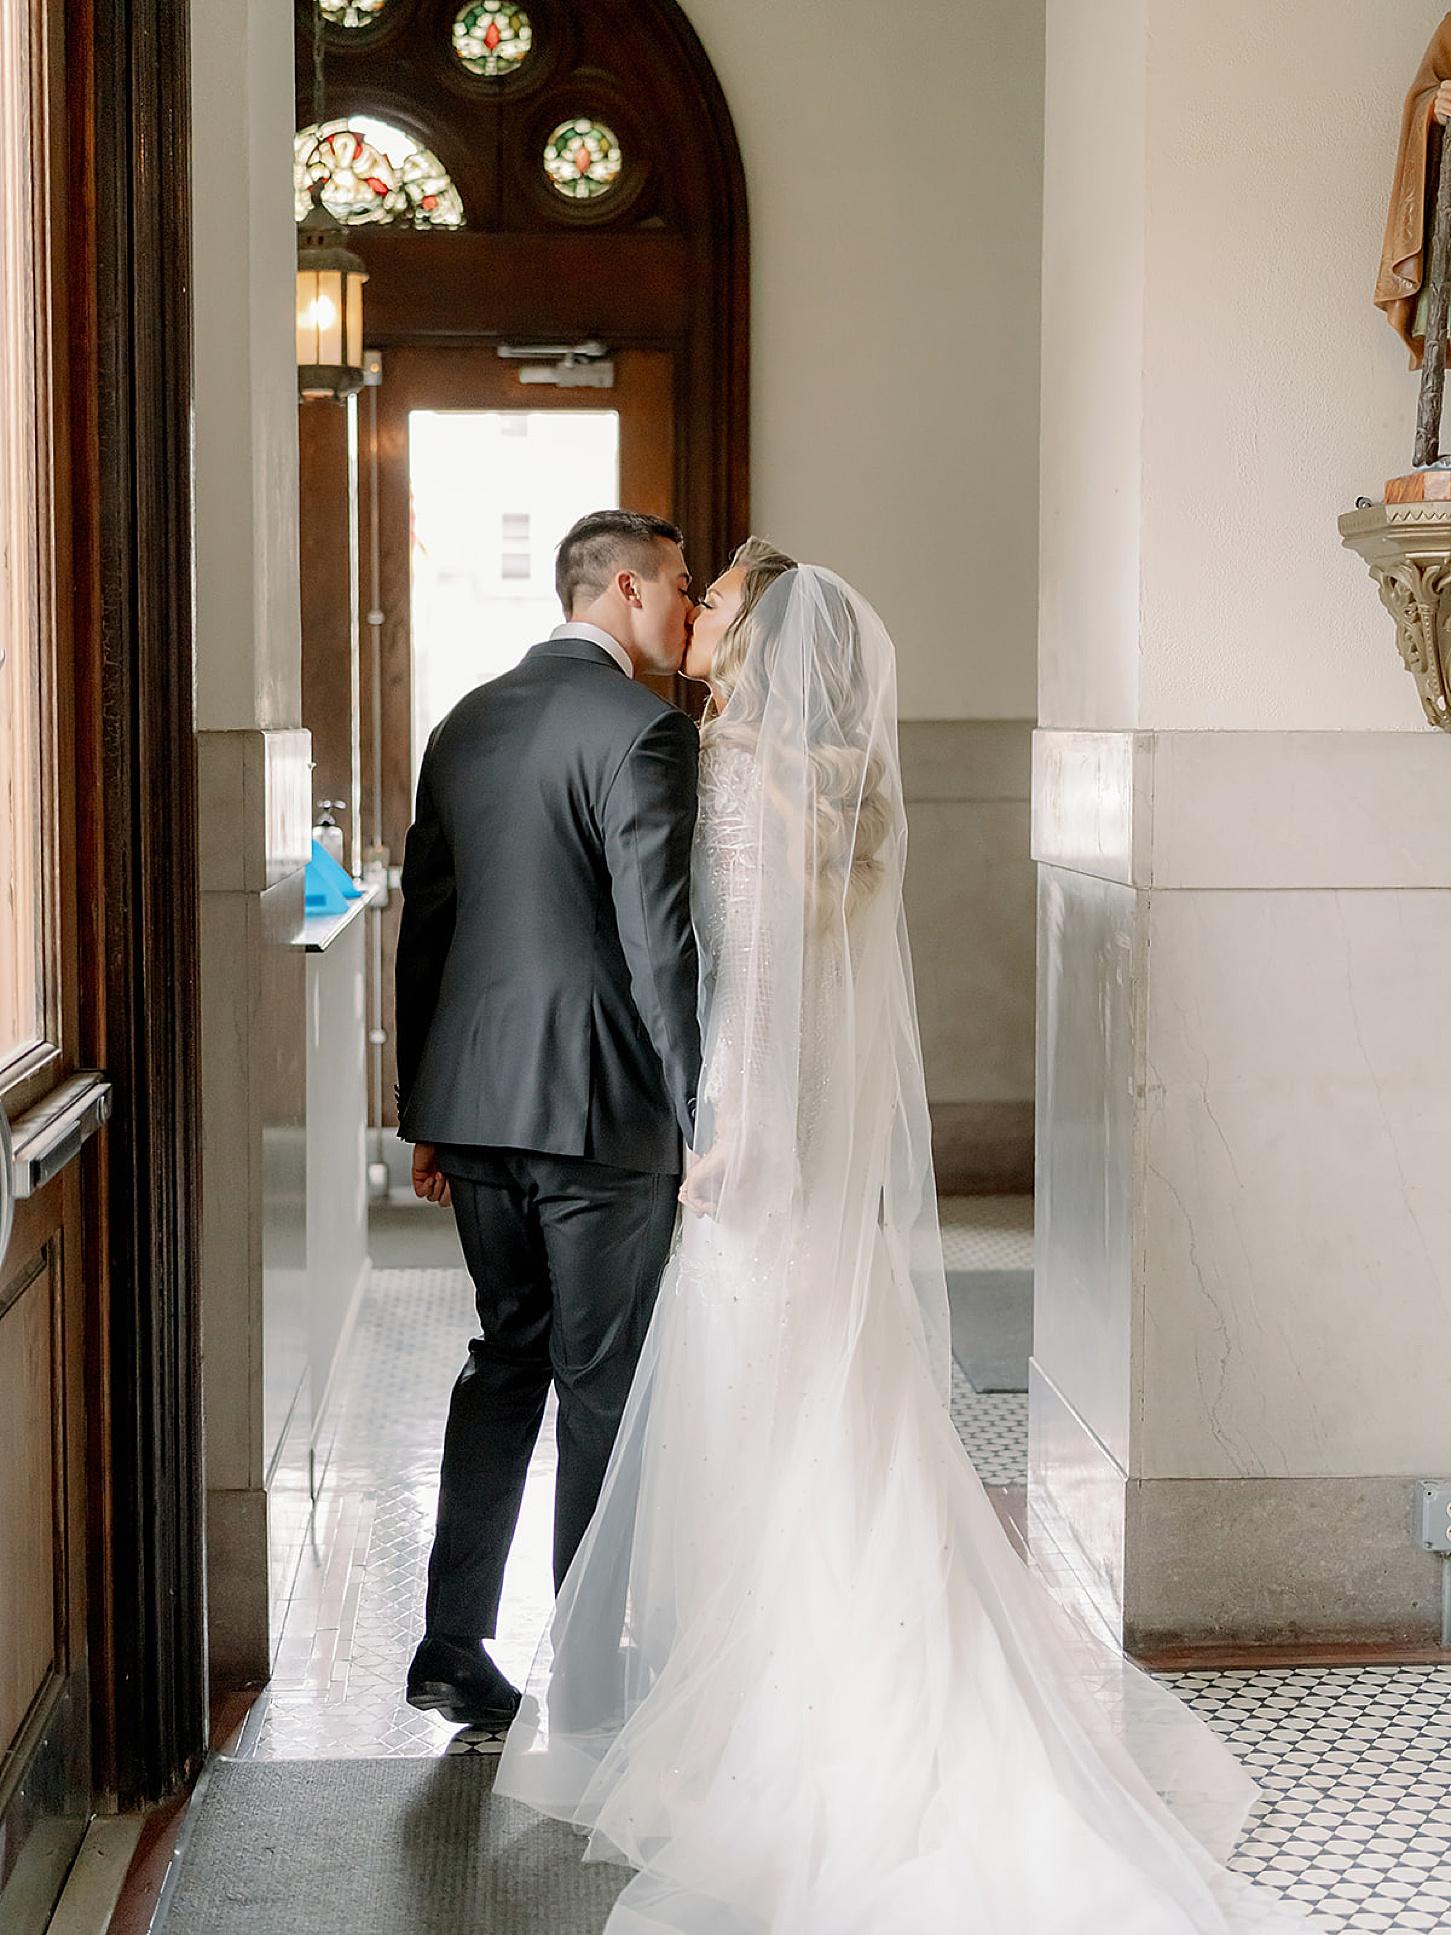 Atlantic City Wedding Photography Studio by Magdalena Studios Lexy Cha 0027